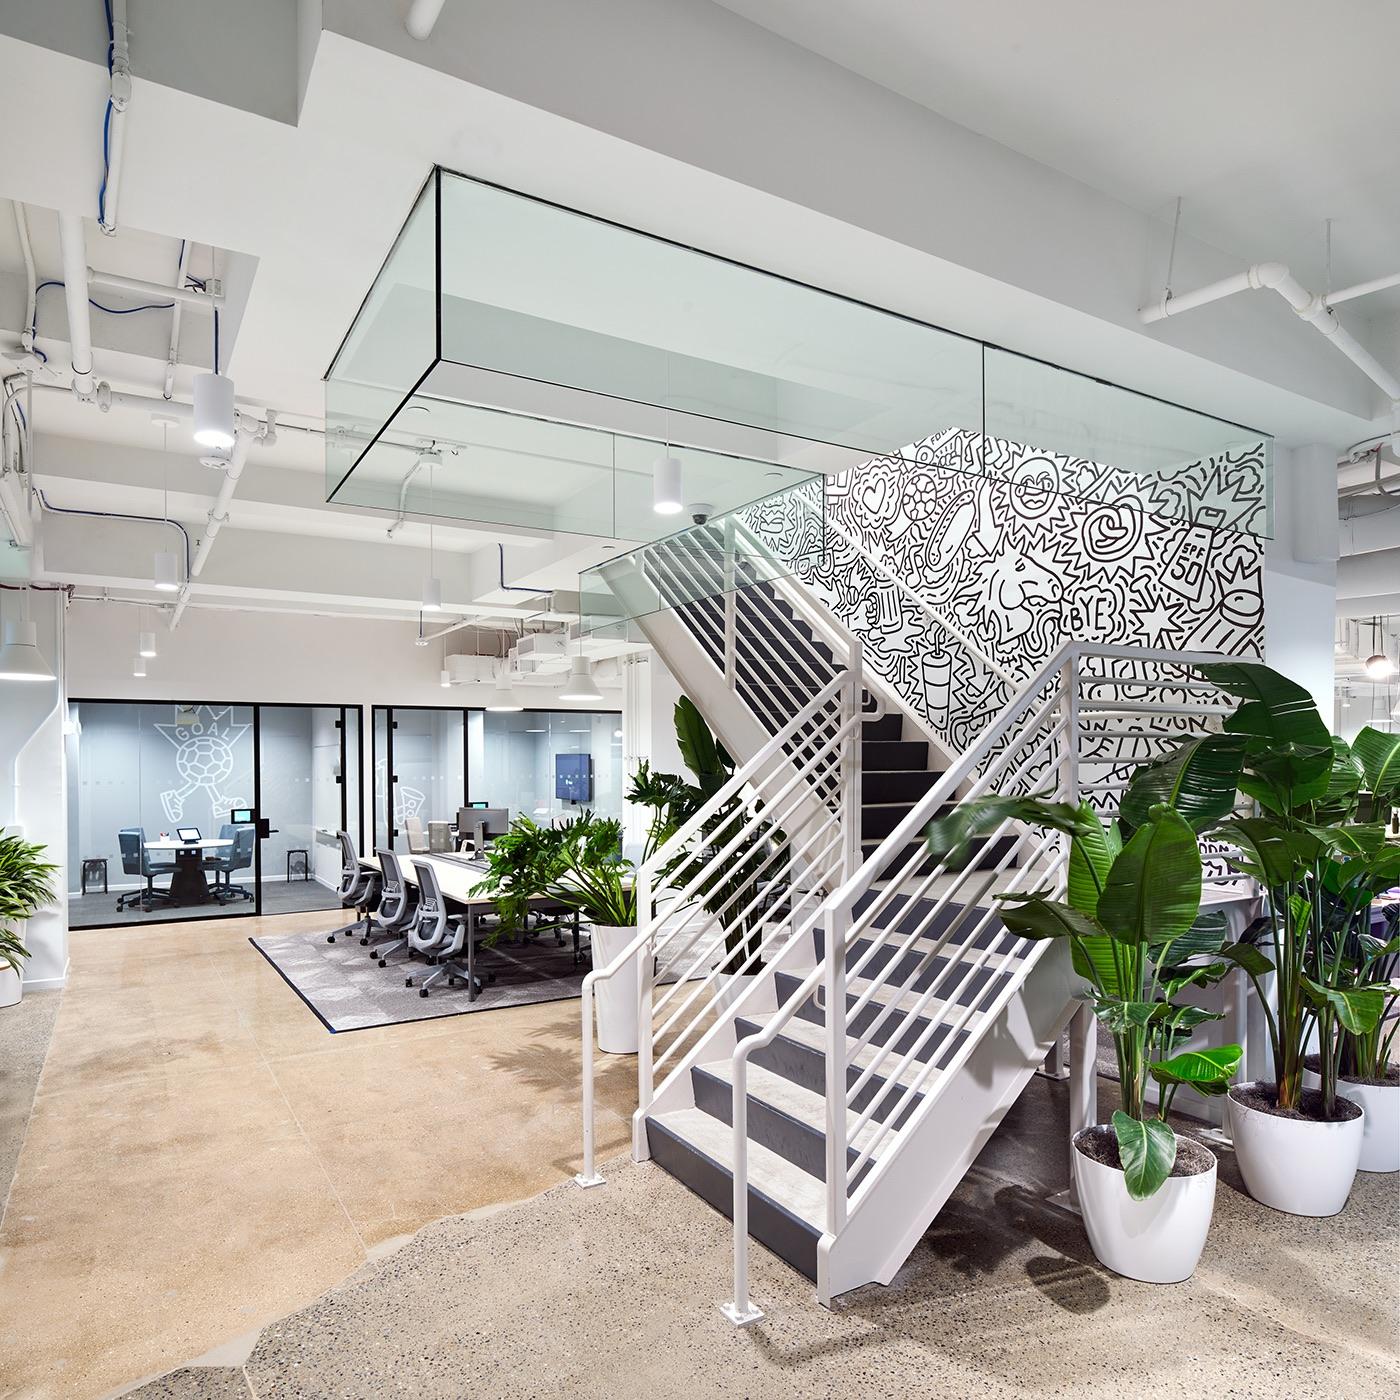 seatgeek-nyc-office-4